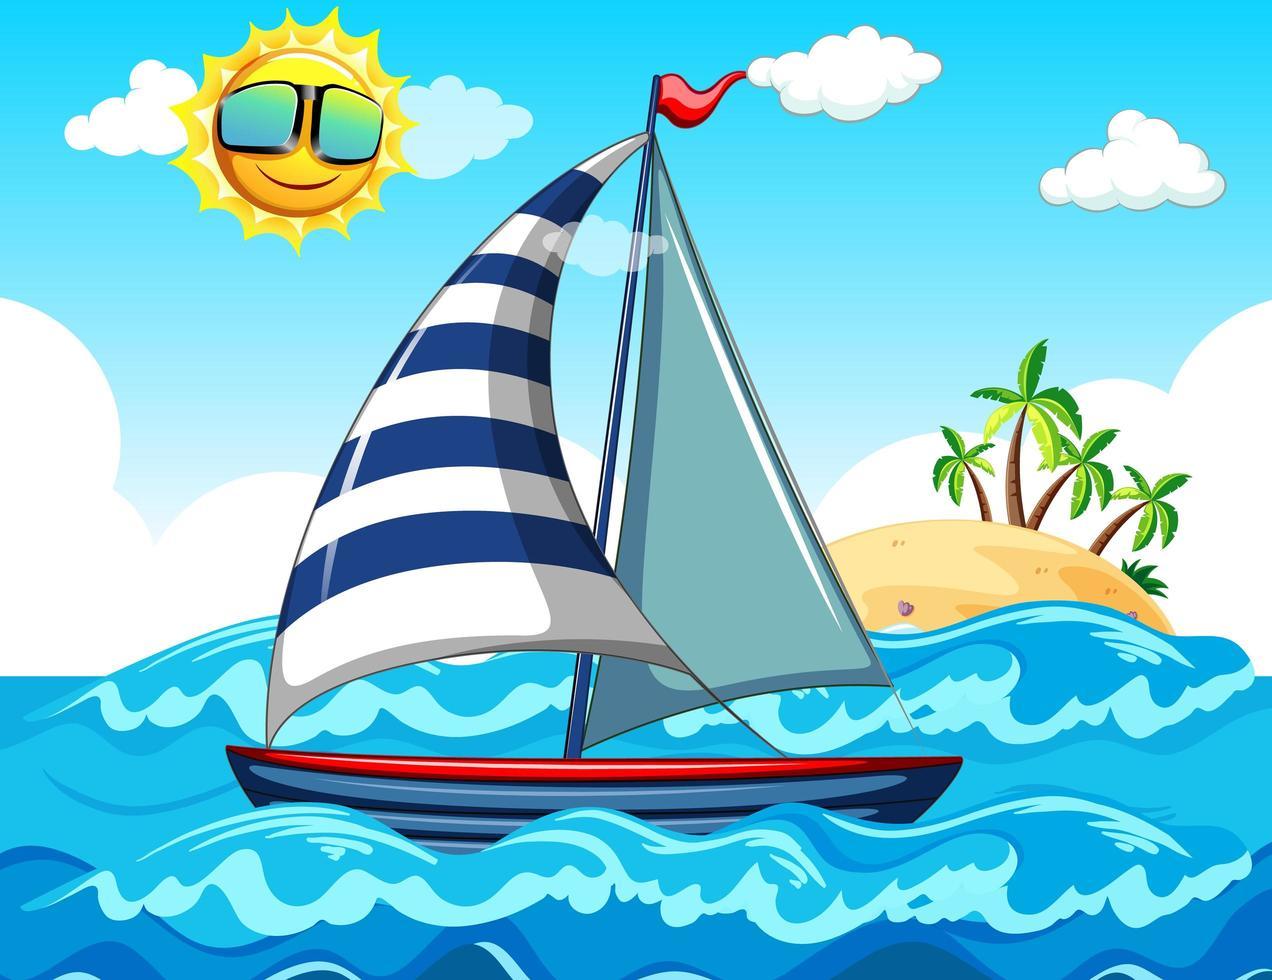 Seeszene mit einem Segelboot vektor